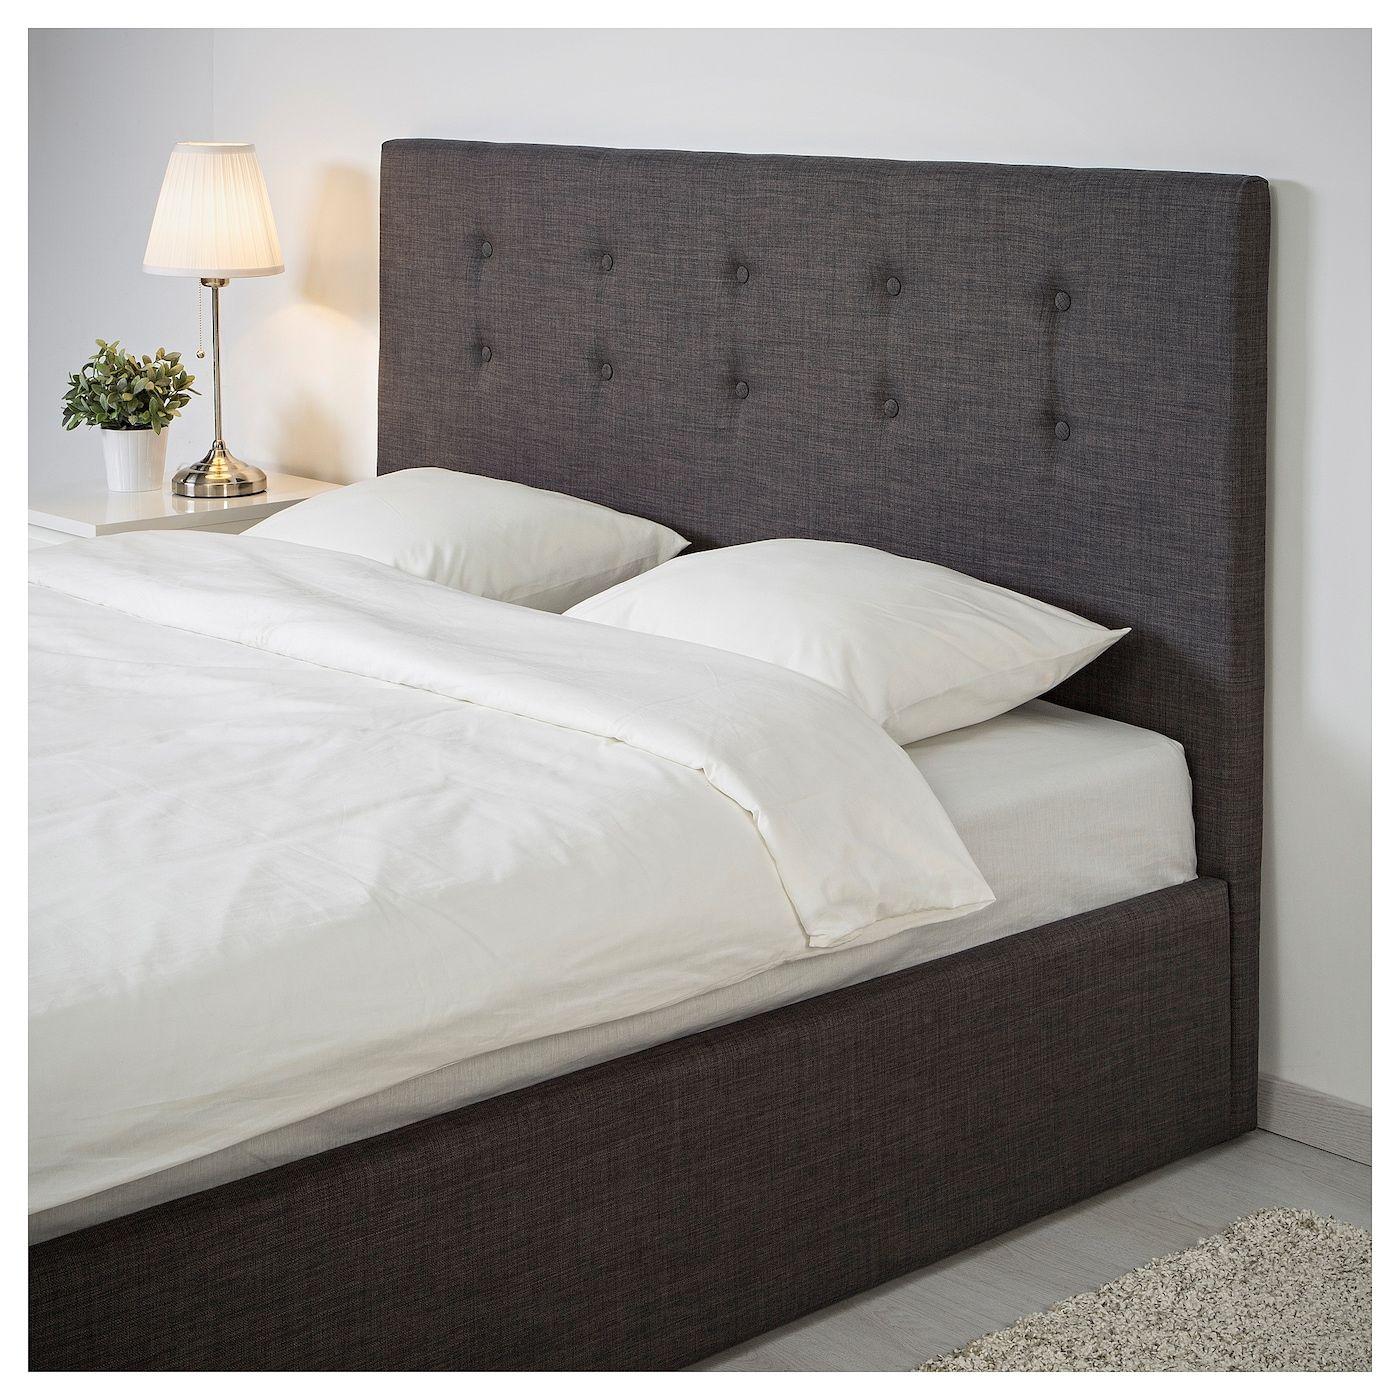 Ikea Gvarv Bettgestell Mit Aufbewahrung Bettgestell Bett Ideen Schlafzimmer Inspirationen